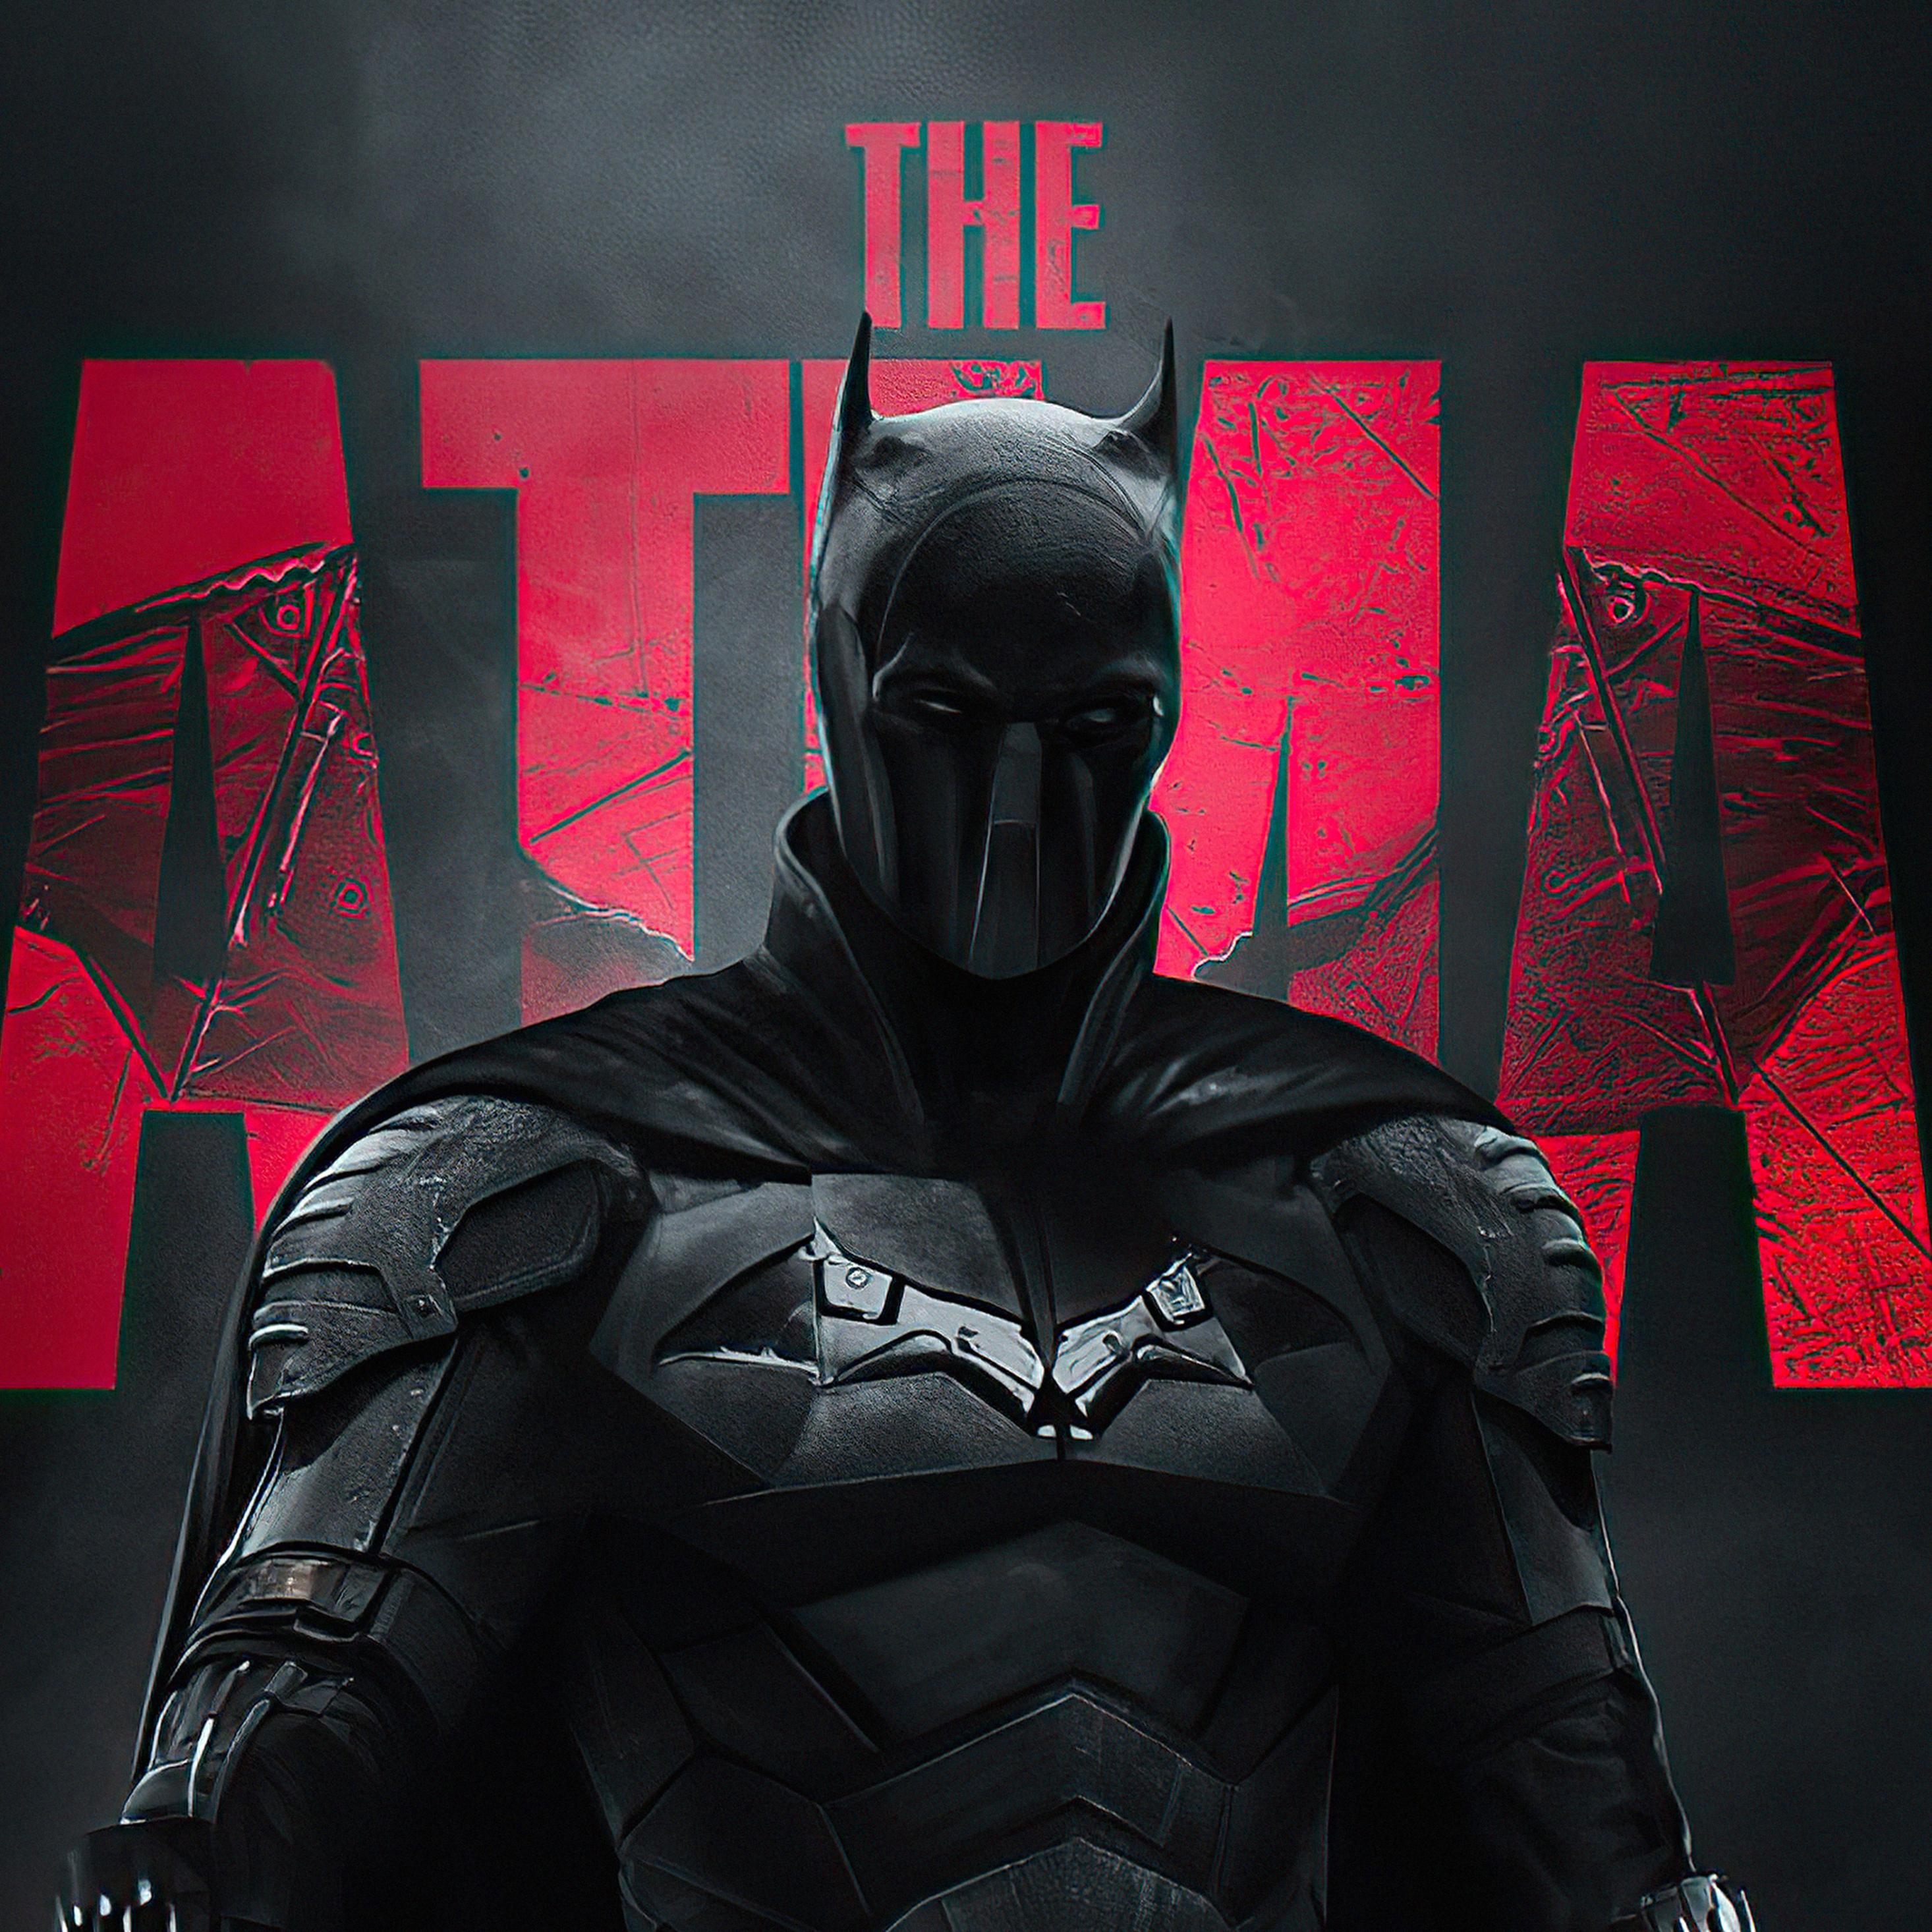 the-batman-dc-darkness-4k-0o.jpg